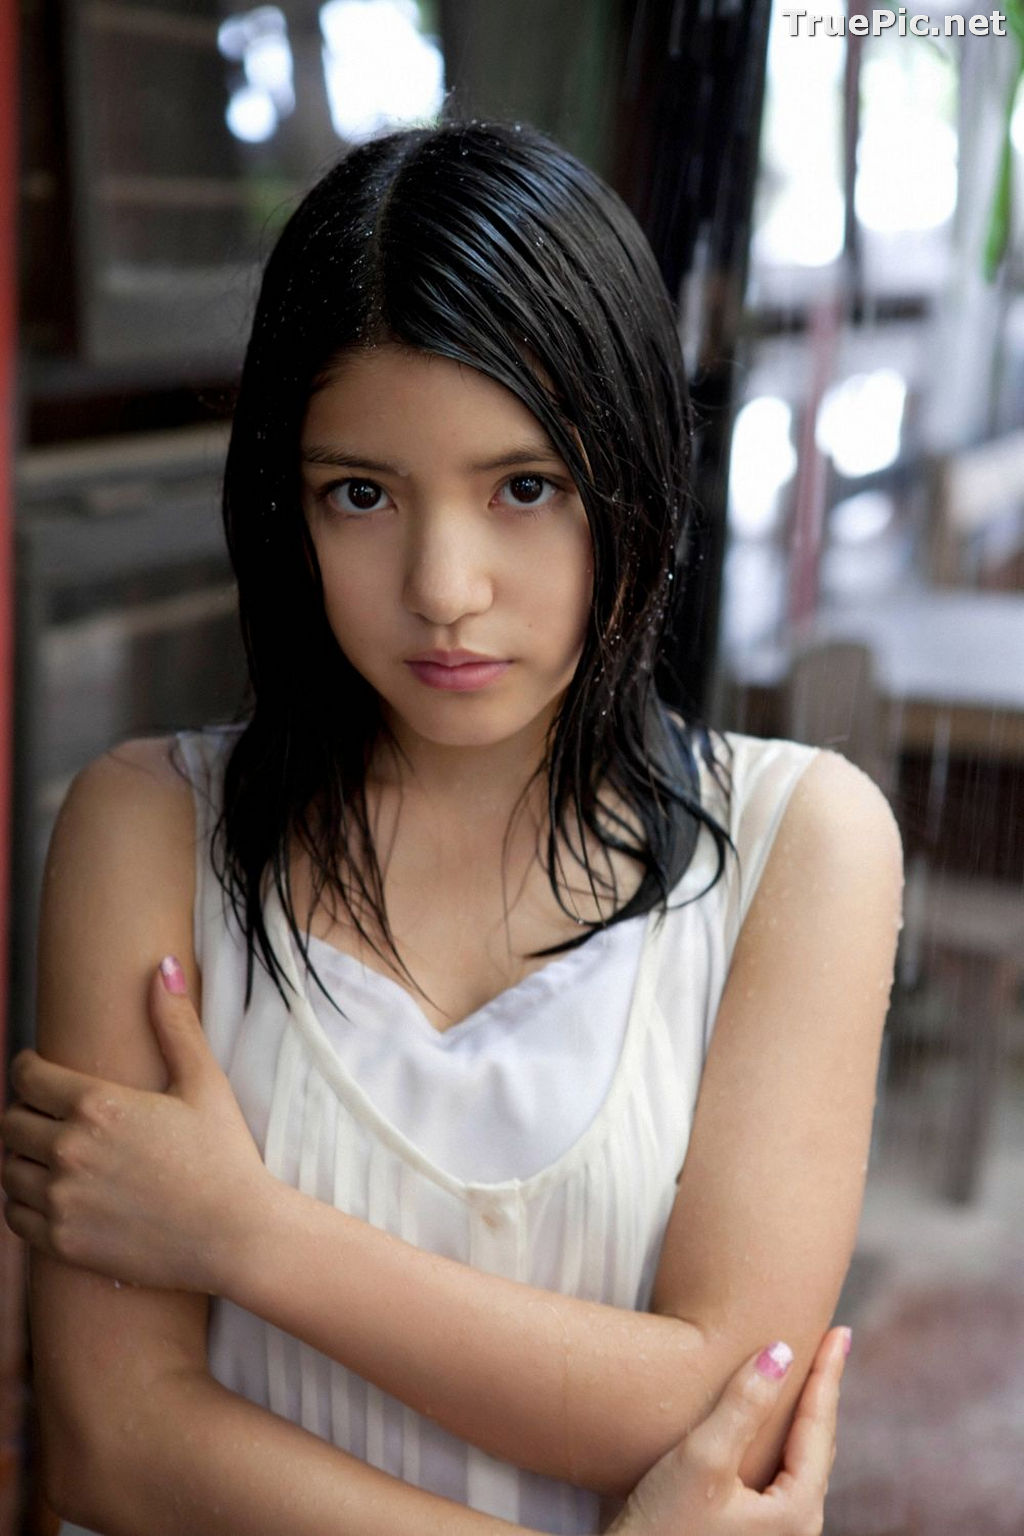 Image [YS Web] Vol.506 - Japanese Actress and Singer - Umika Kawashima - TruePic.net - Picture-12